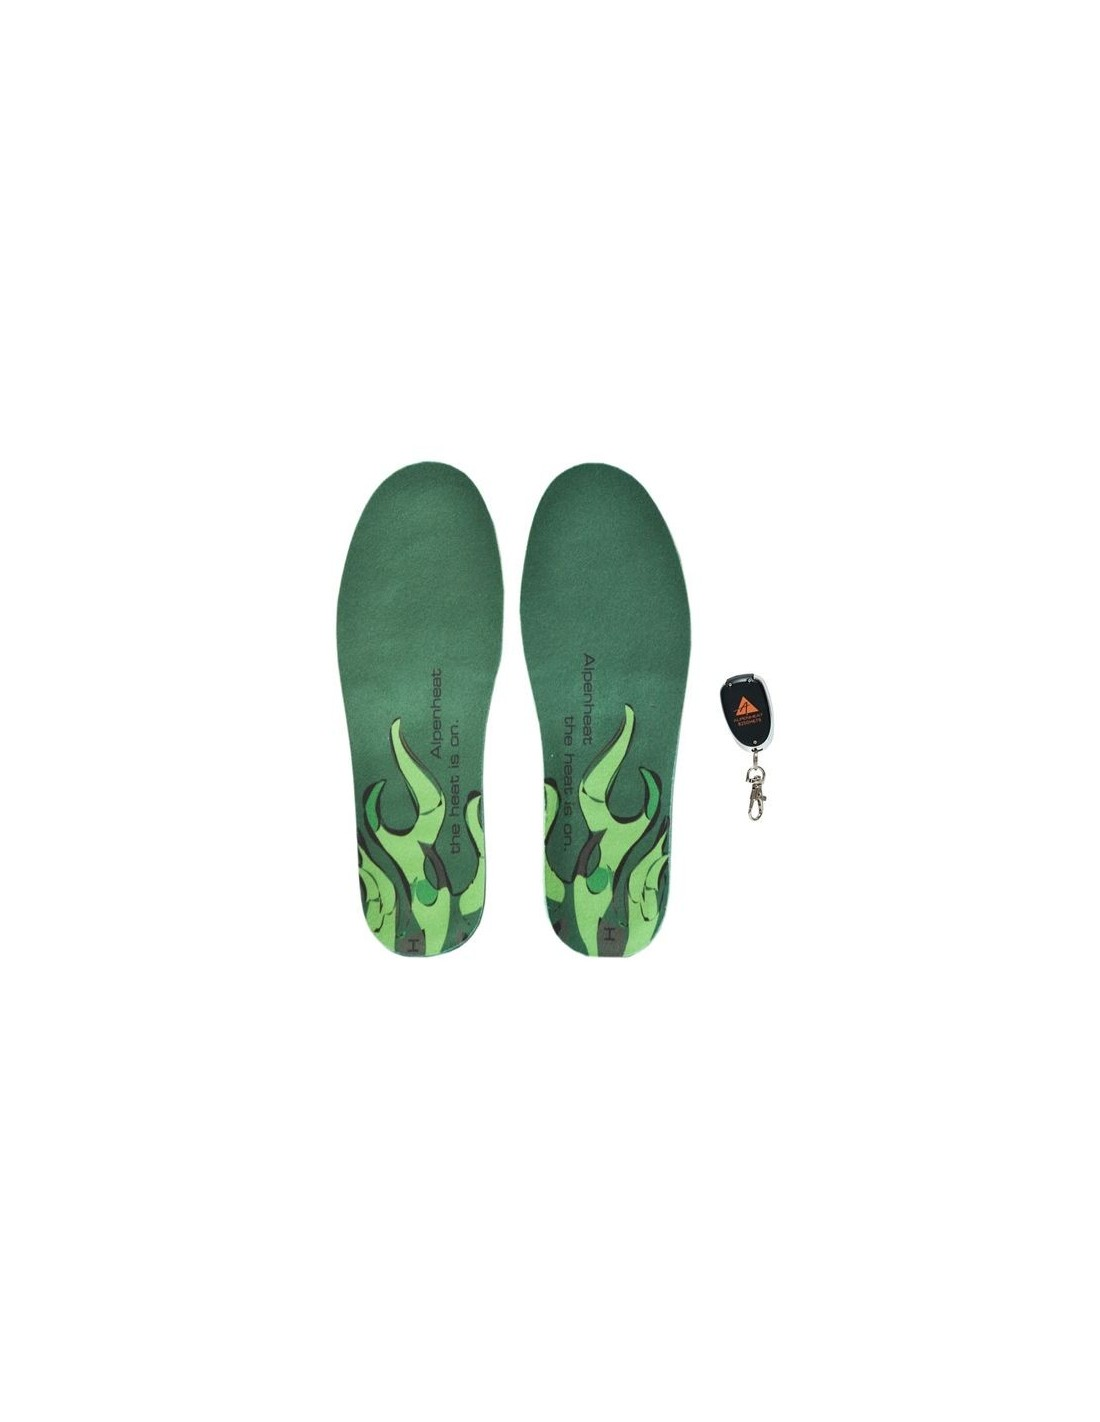 Alpenheat Schuhheizung Wireless Hotsole Ah11 Zum Bestpreis Kaufen